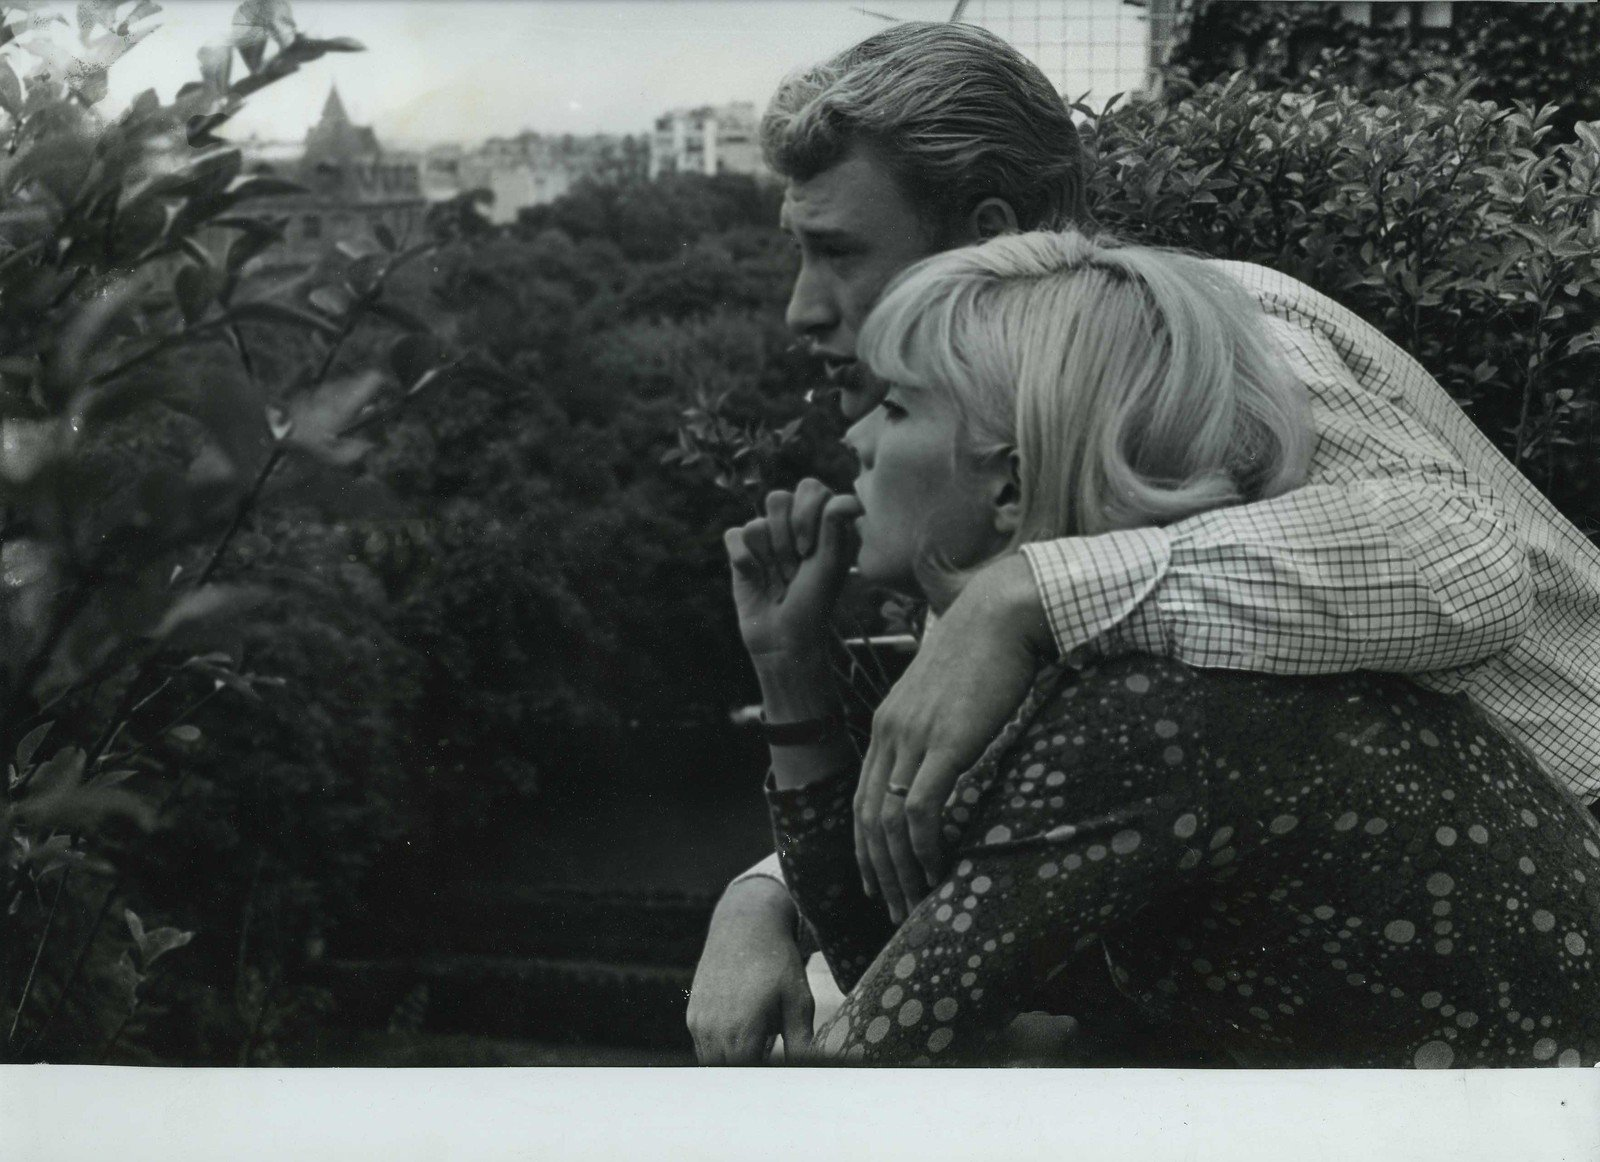 PROPRIETE OU A RESIDE JOHNNY HALLYDAY ( 3/10 ) 'NEUILLY SUR SEINE' ( 1965 ) 210227020149276594